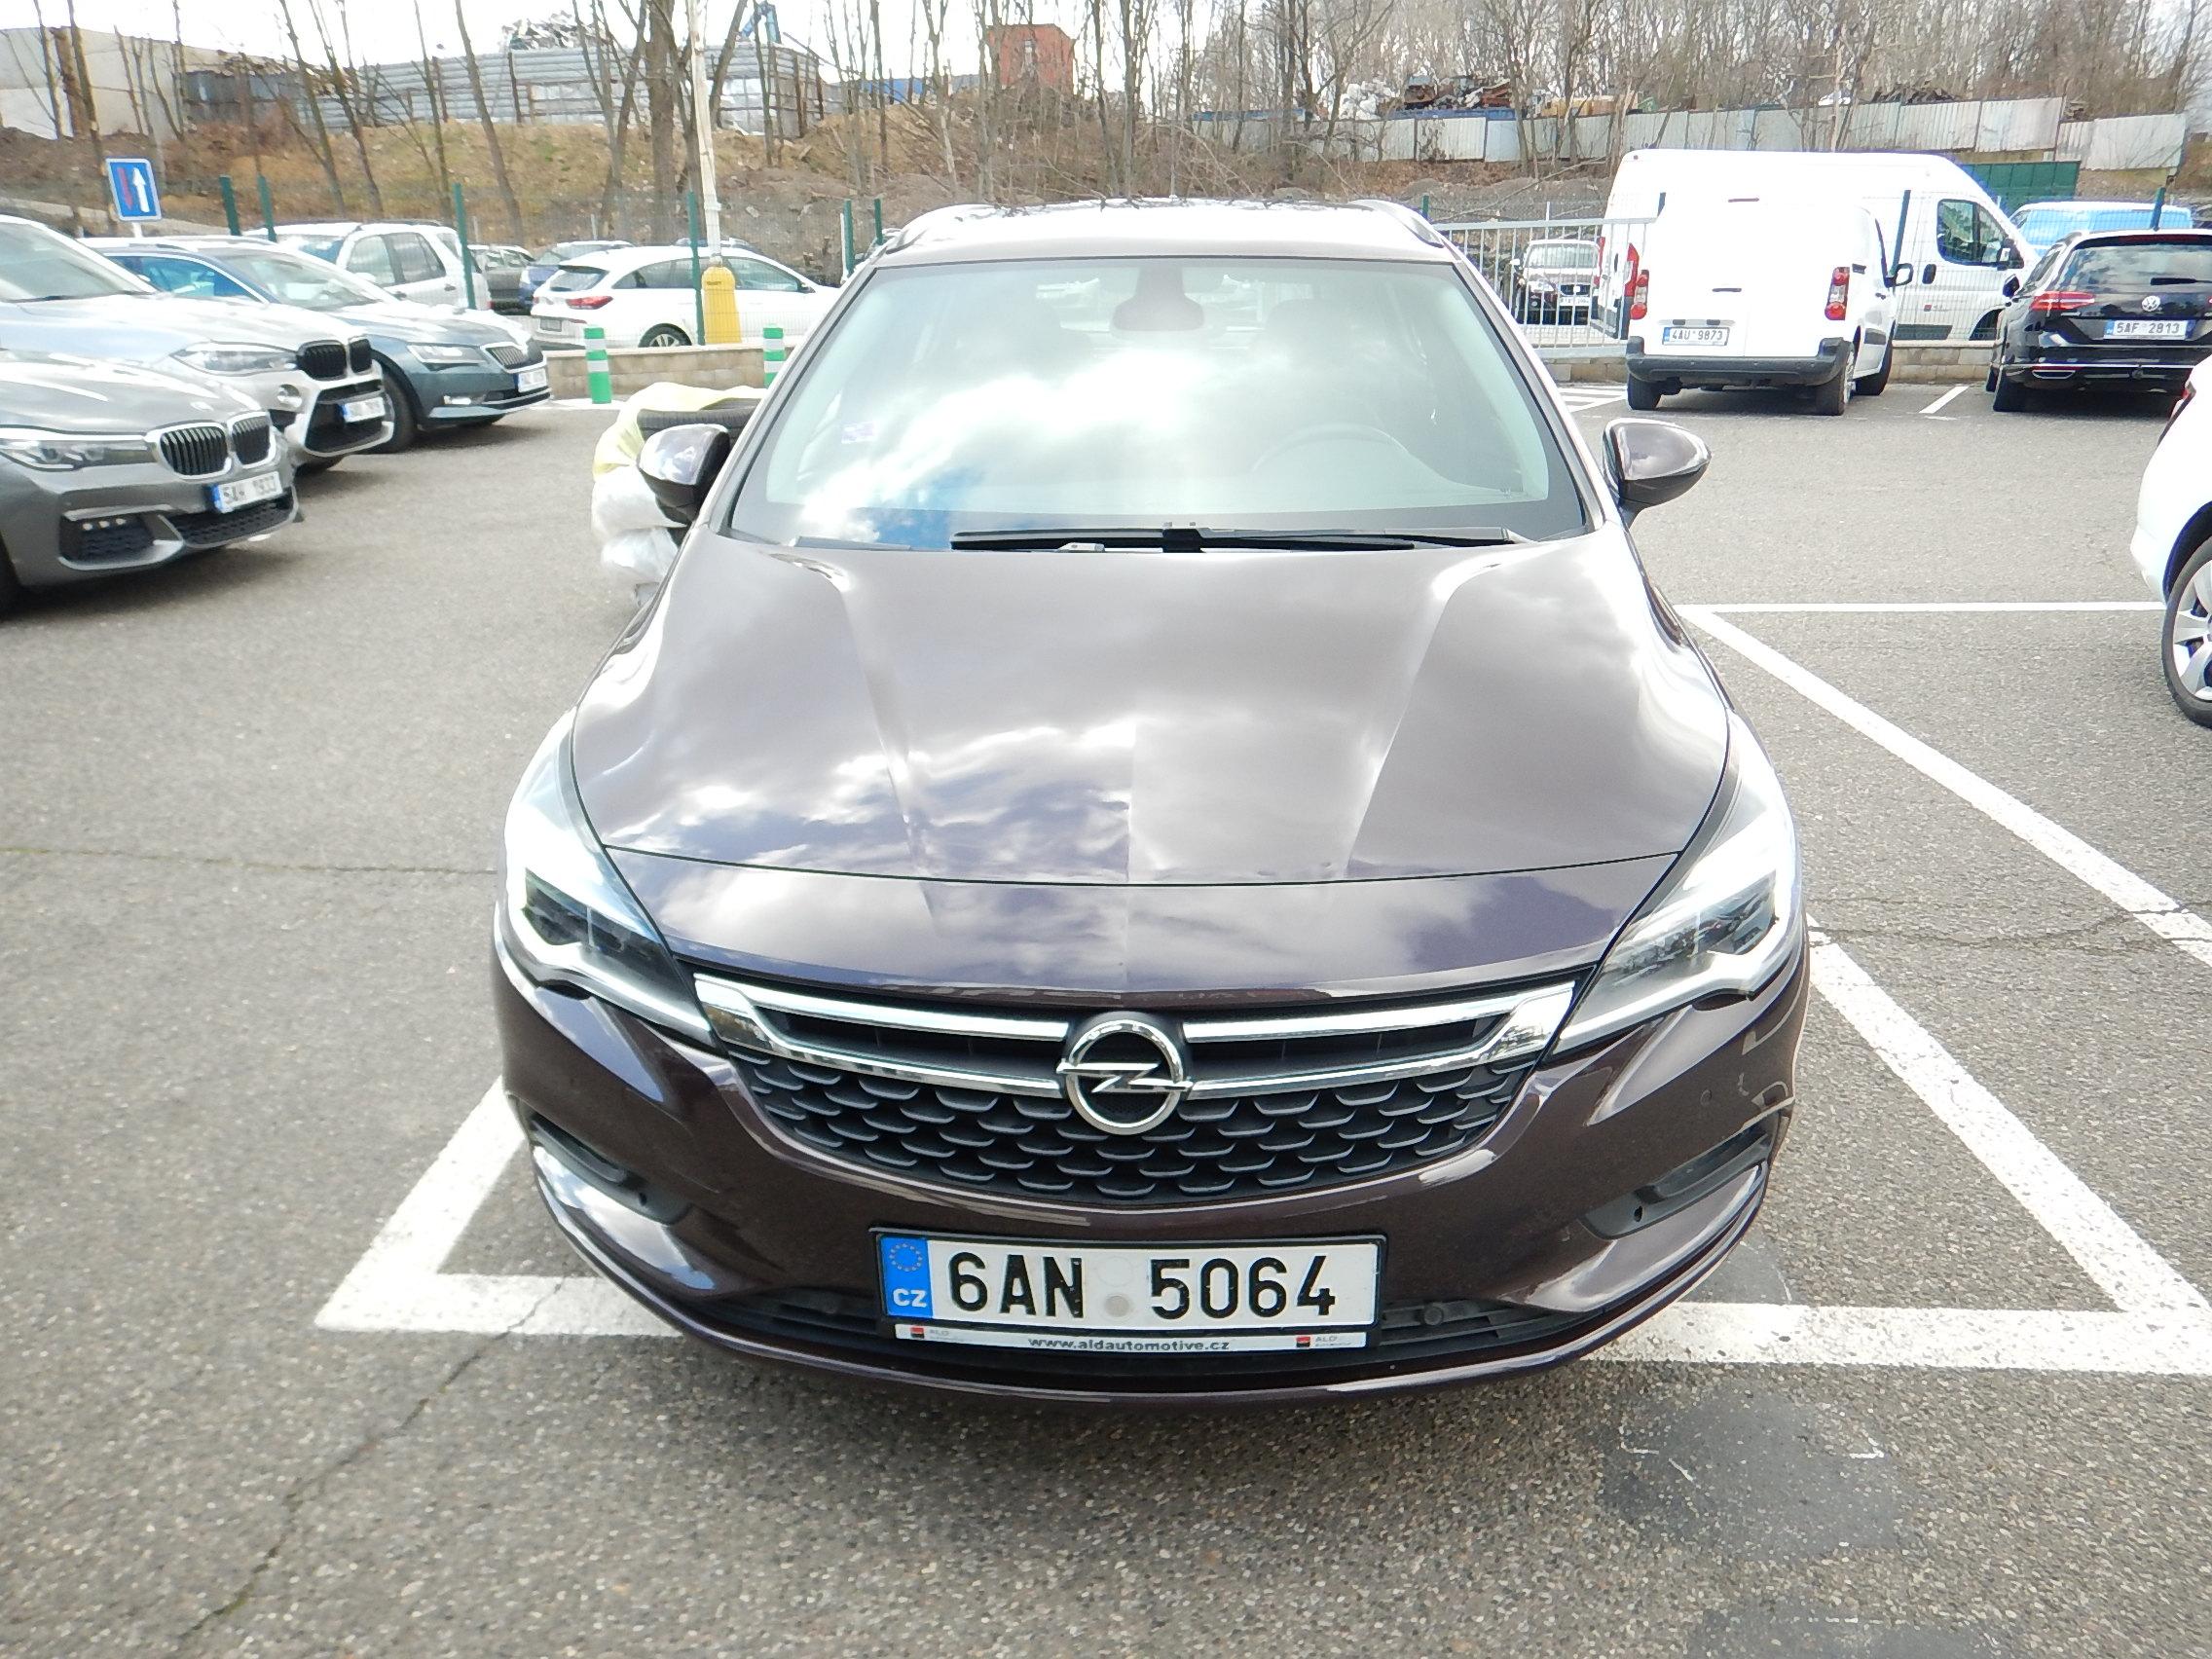 Opel - Astra V '17 5 dv. kombi